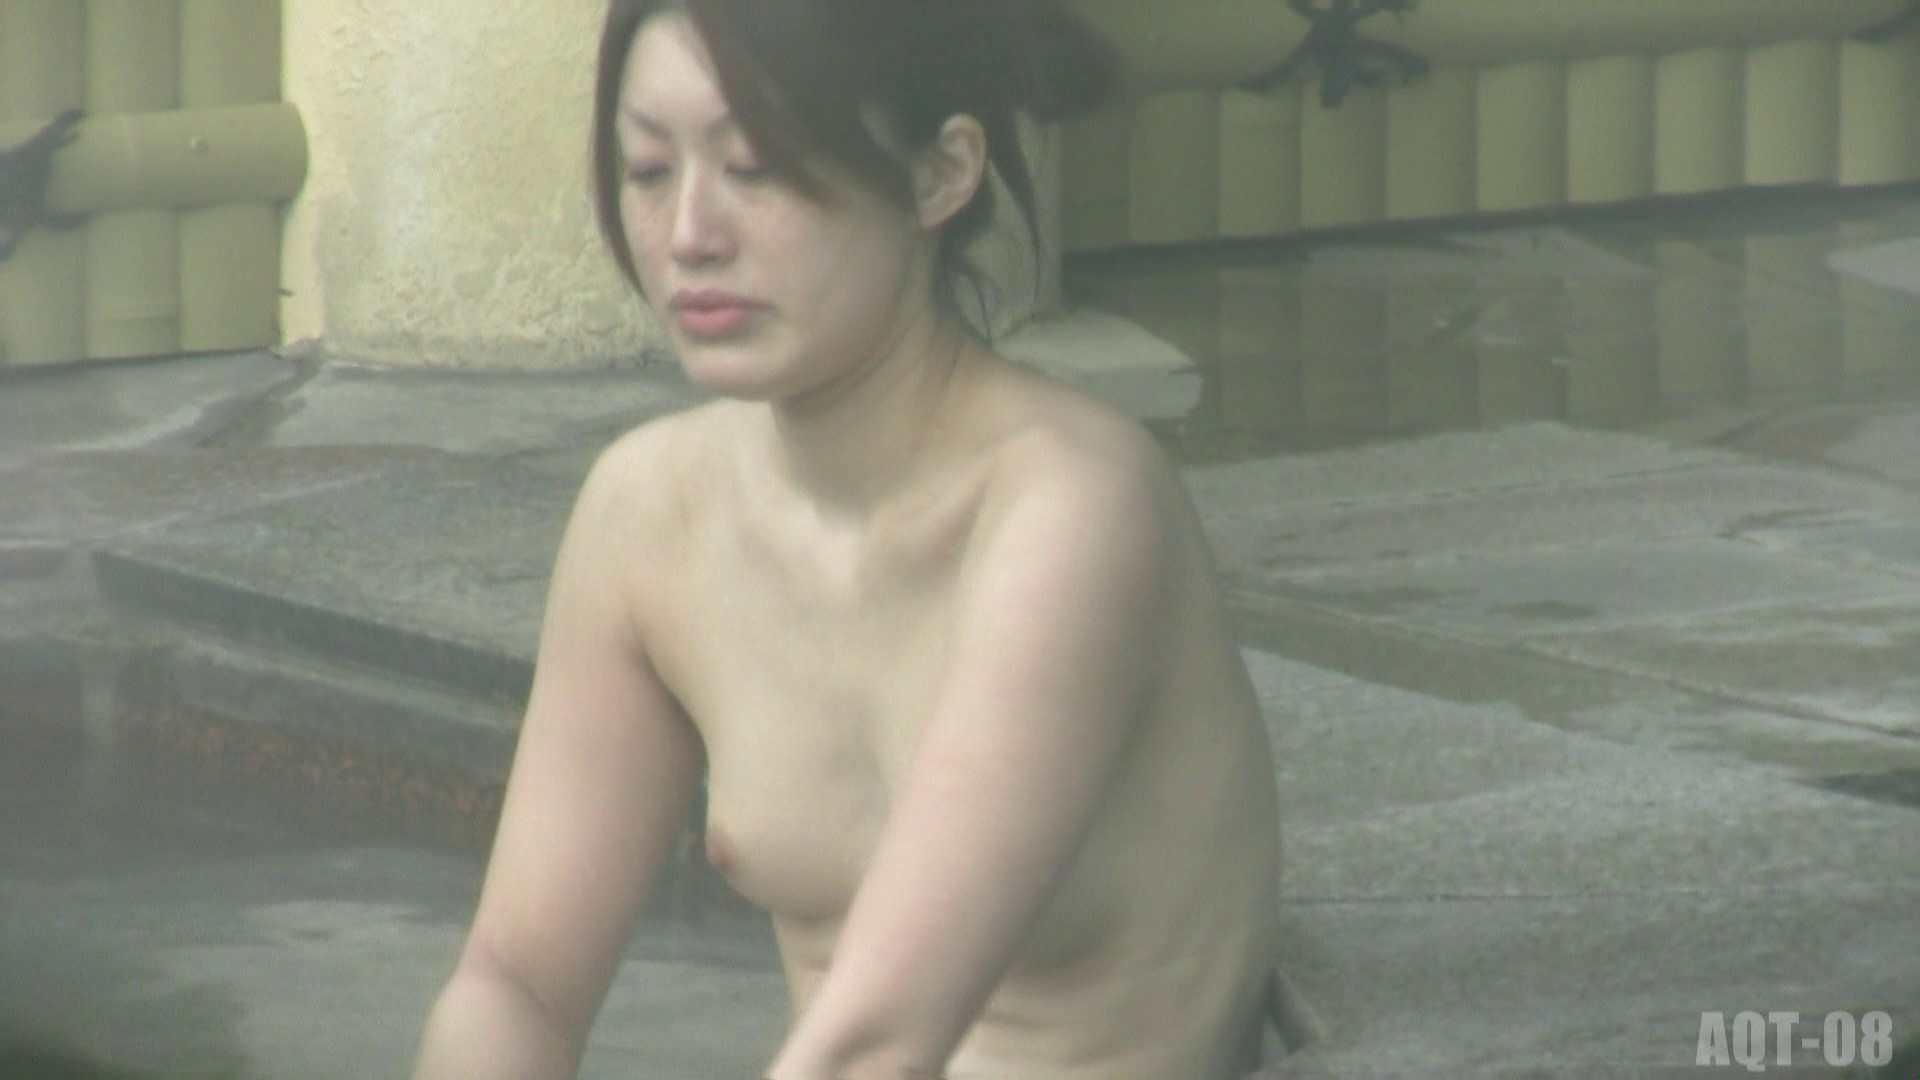 Aquaな露天風呂Vol.775 盗撮師作品 AV無料動画キャプチャ 98pic 5